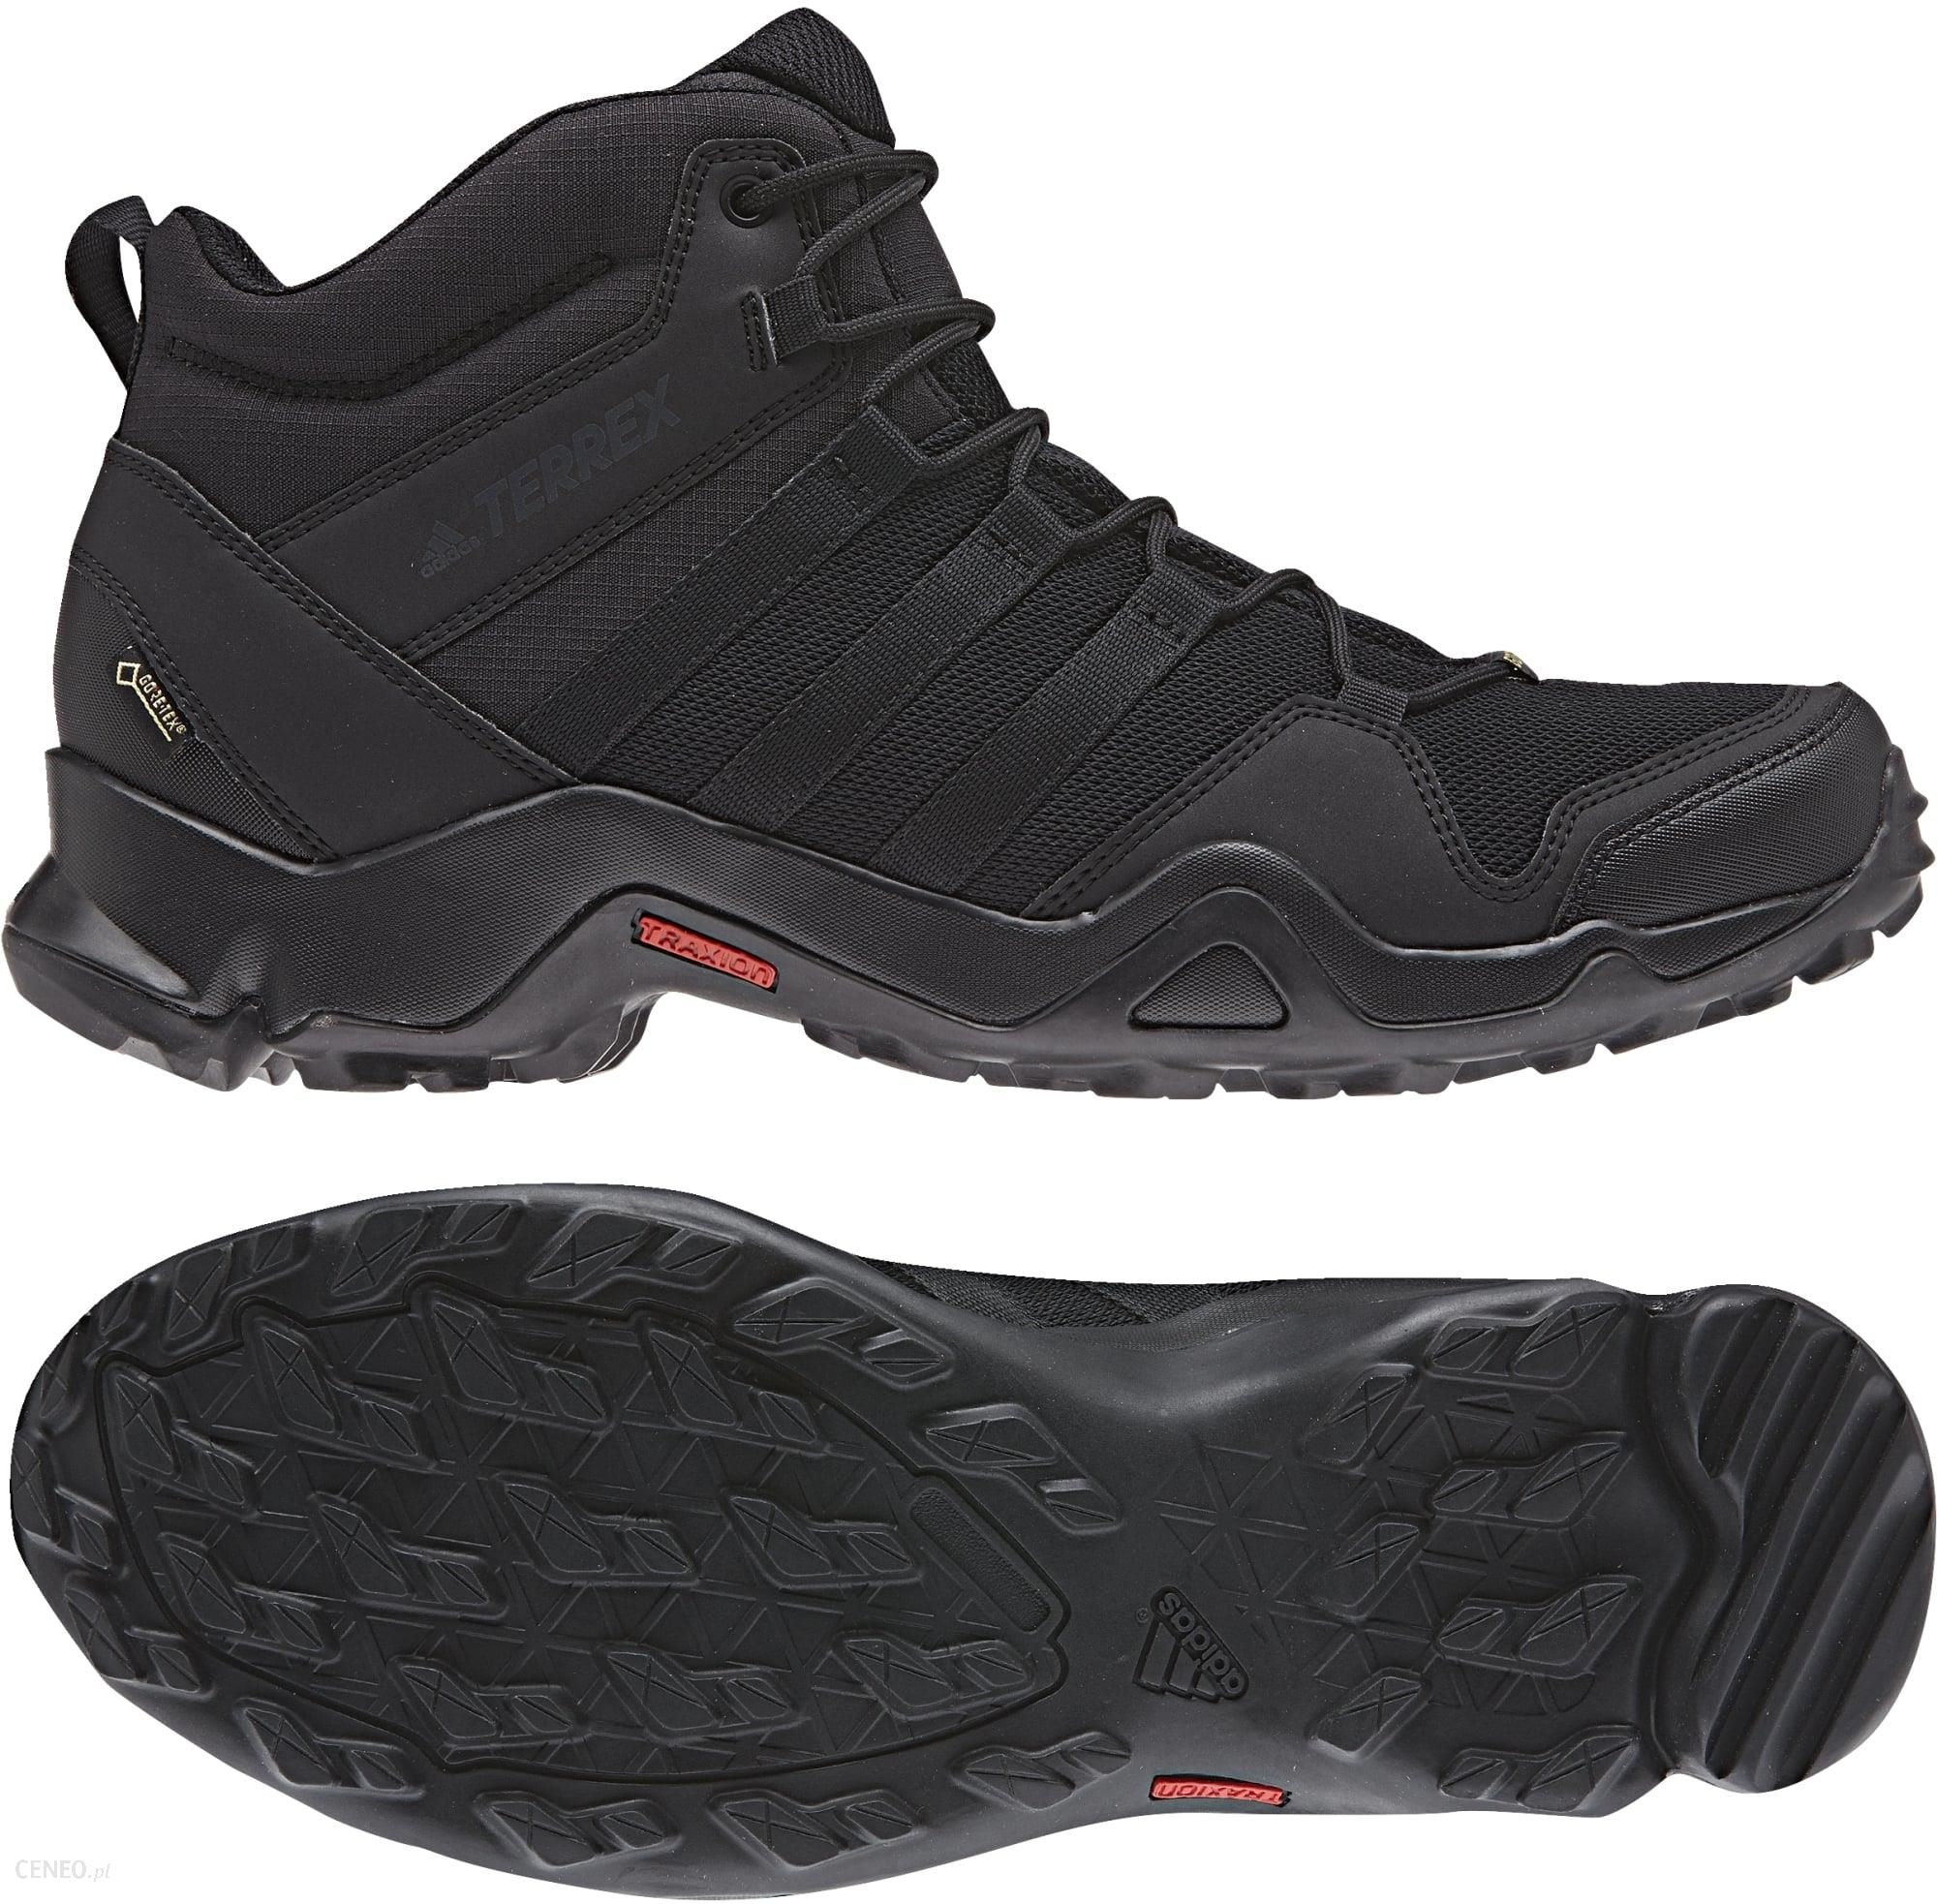 Buty trekkingowe Adidas Terrex AX2R Mid GTX CM7697